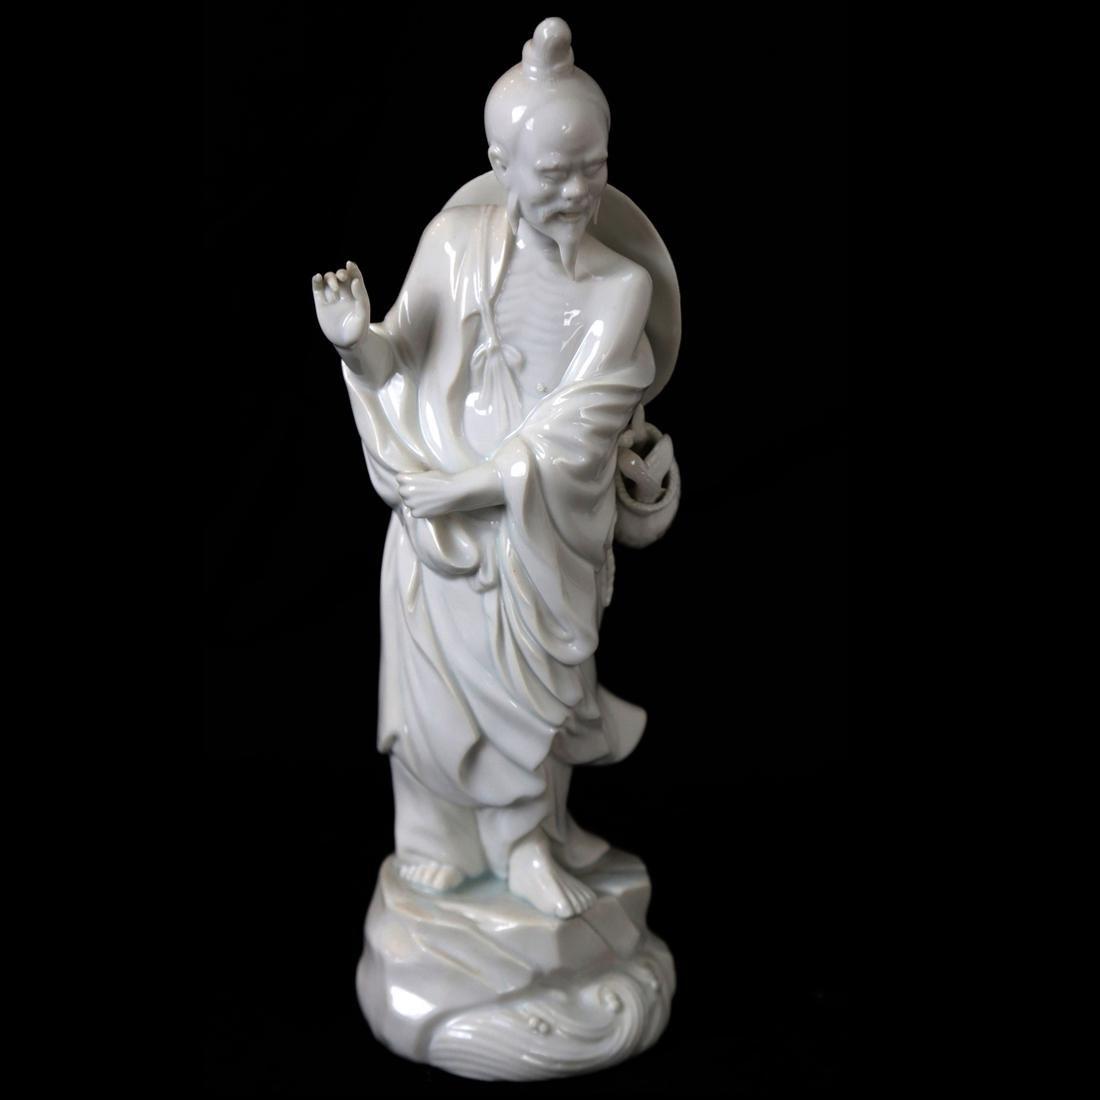 Chinese Blanc de Chine Male Figure